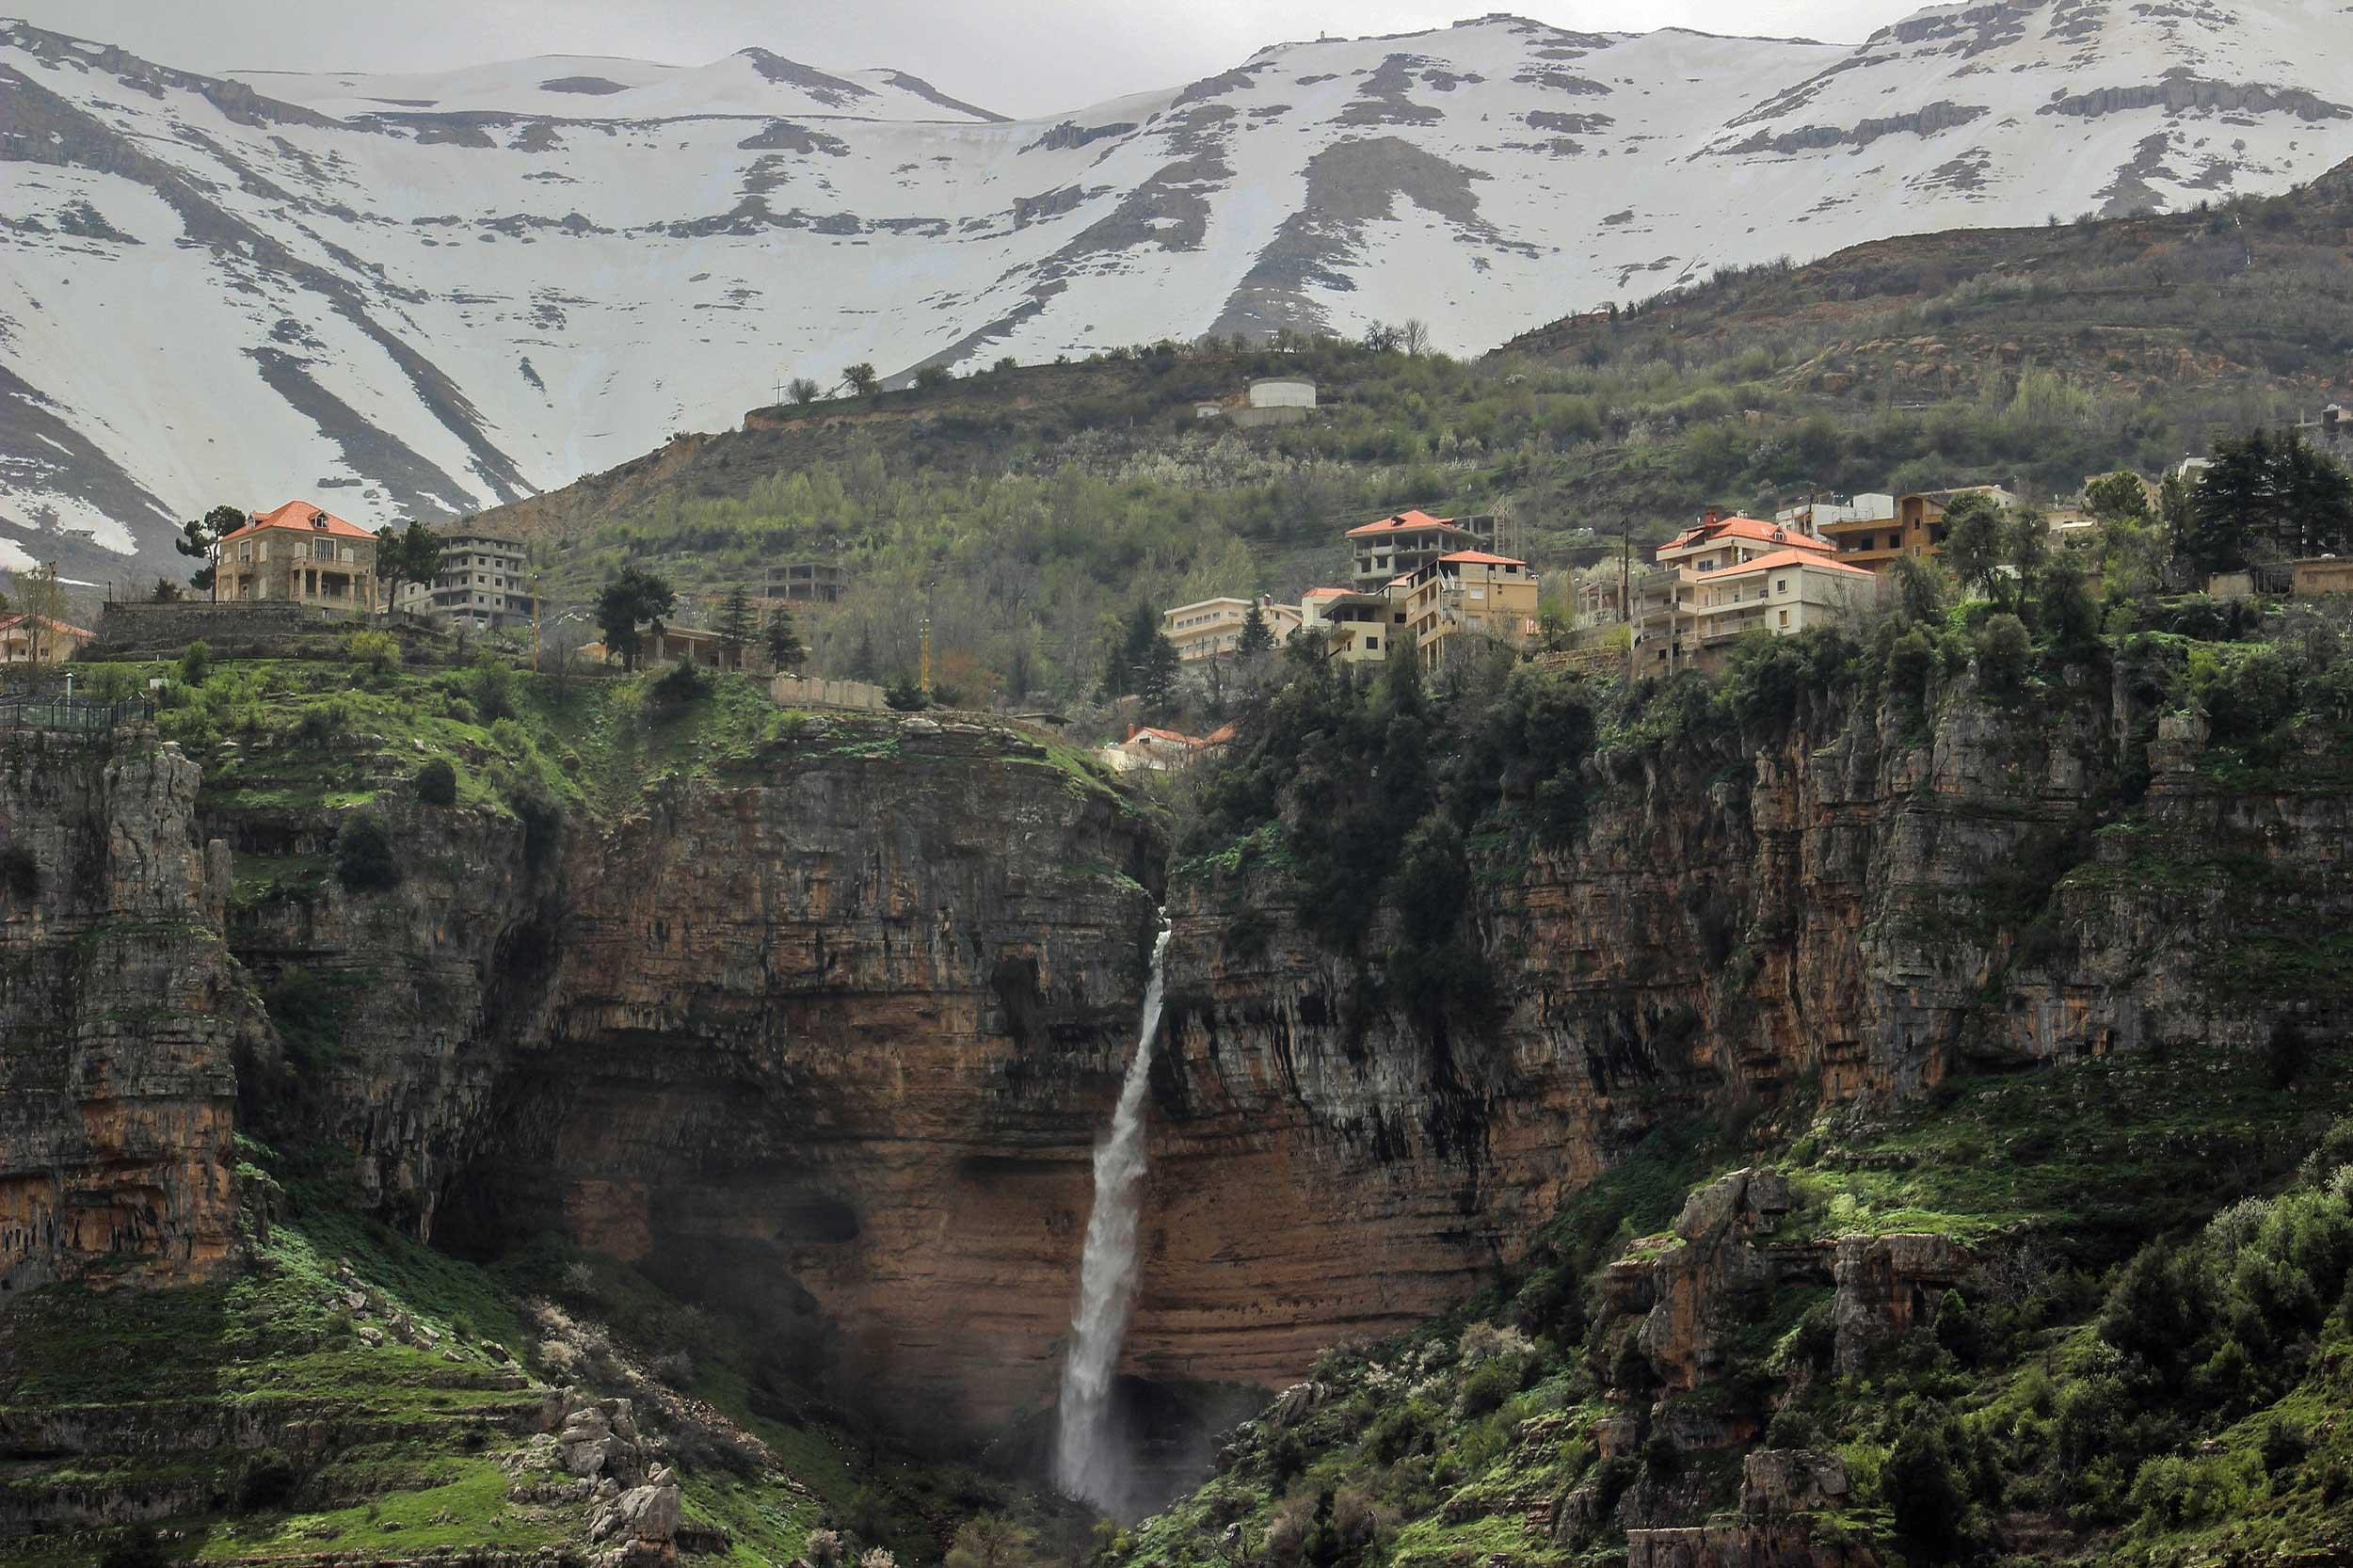 5-epic-waterfalls-to-visit in-lebanon-qannoubine-bcharre-lebanon-travel